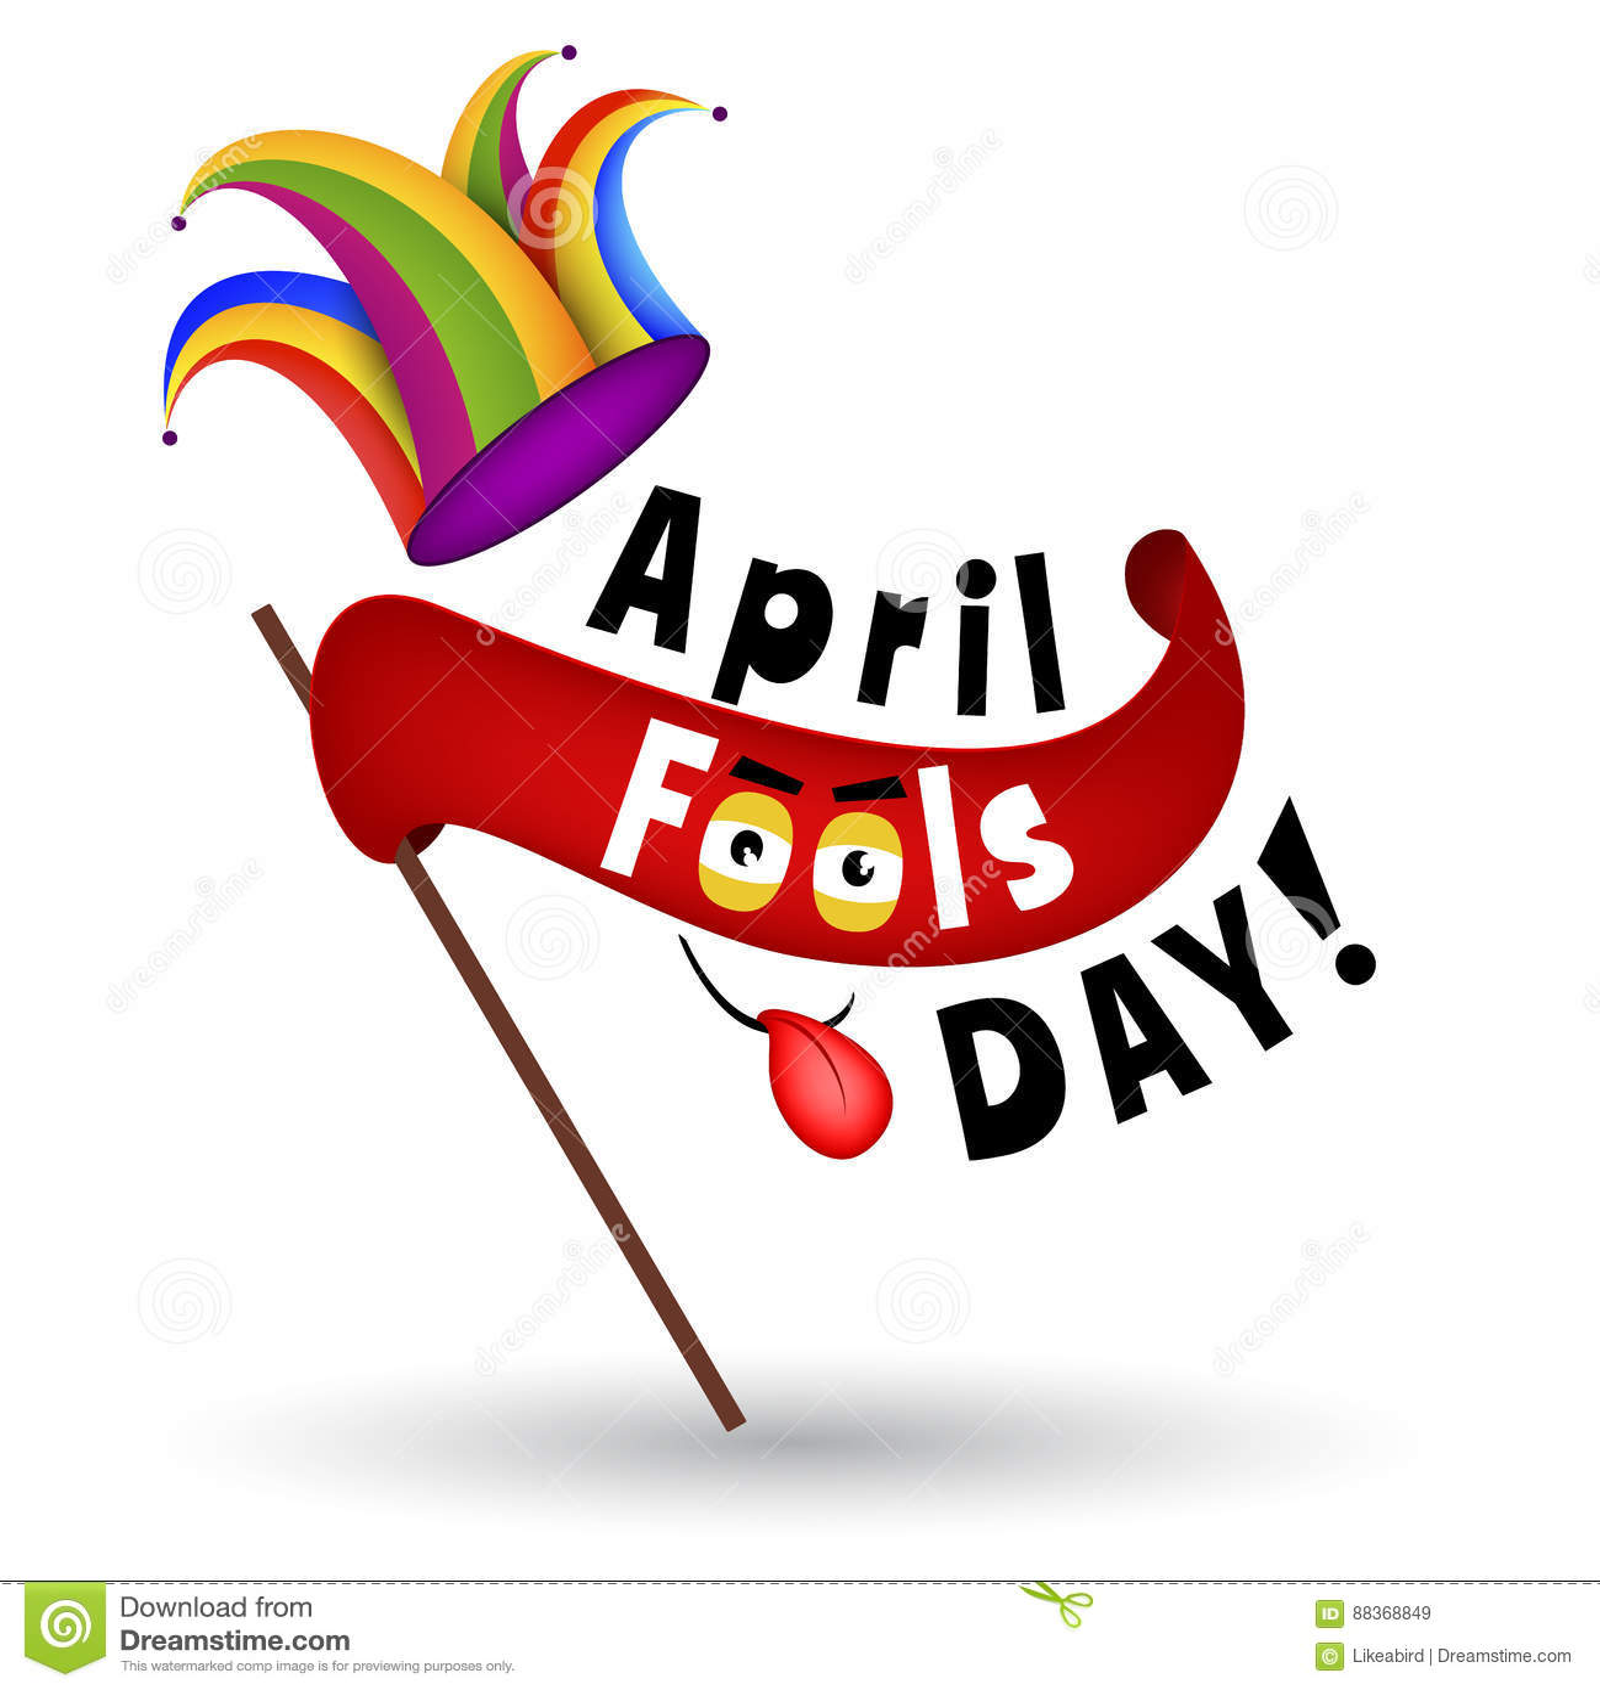 April Fools Day Cartoon Illustration Stock Illustratie - Illustration of  gelukkig, dwaas: 88368849